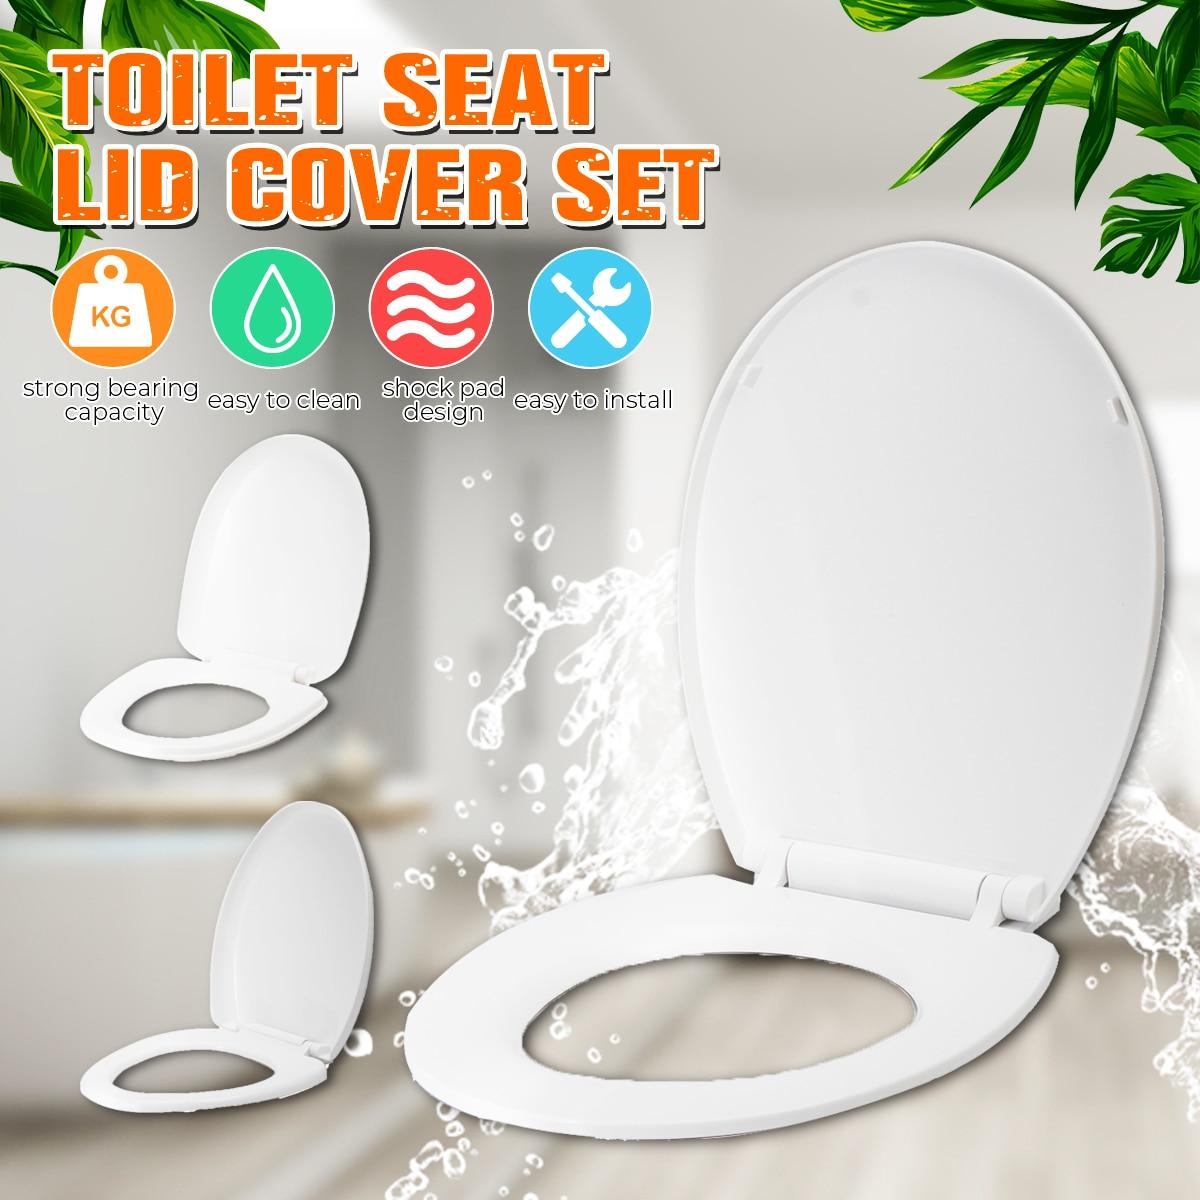 Xueqin 스퀘어 라운드 유니버설 슬로우-닫기 화장실 좌석 뚜껑 세트 abs 두꺼운 변기 교체 항균 3 종류